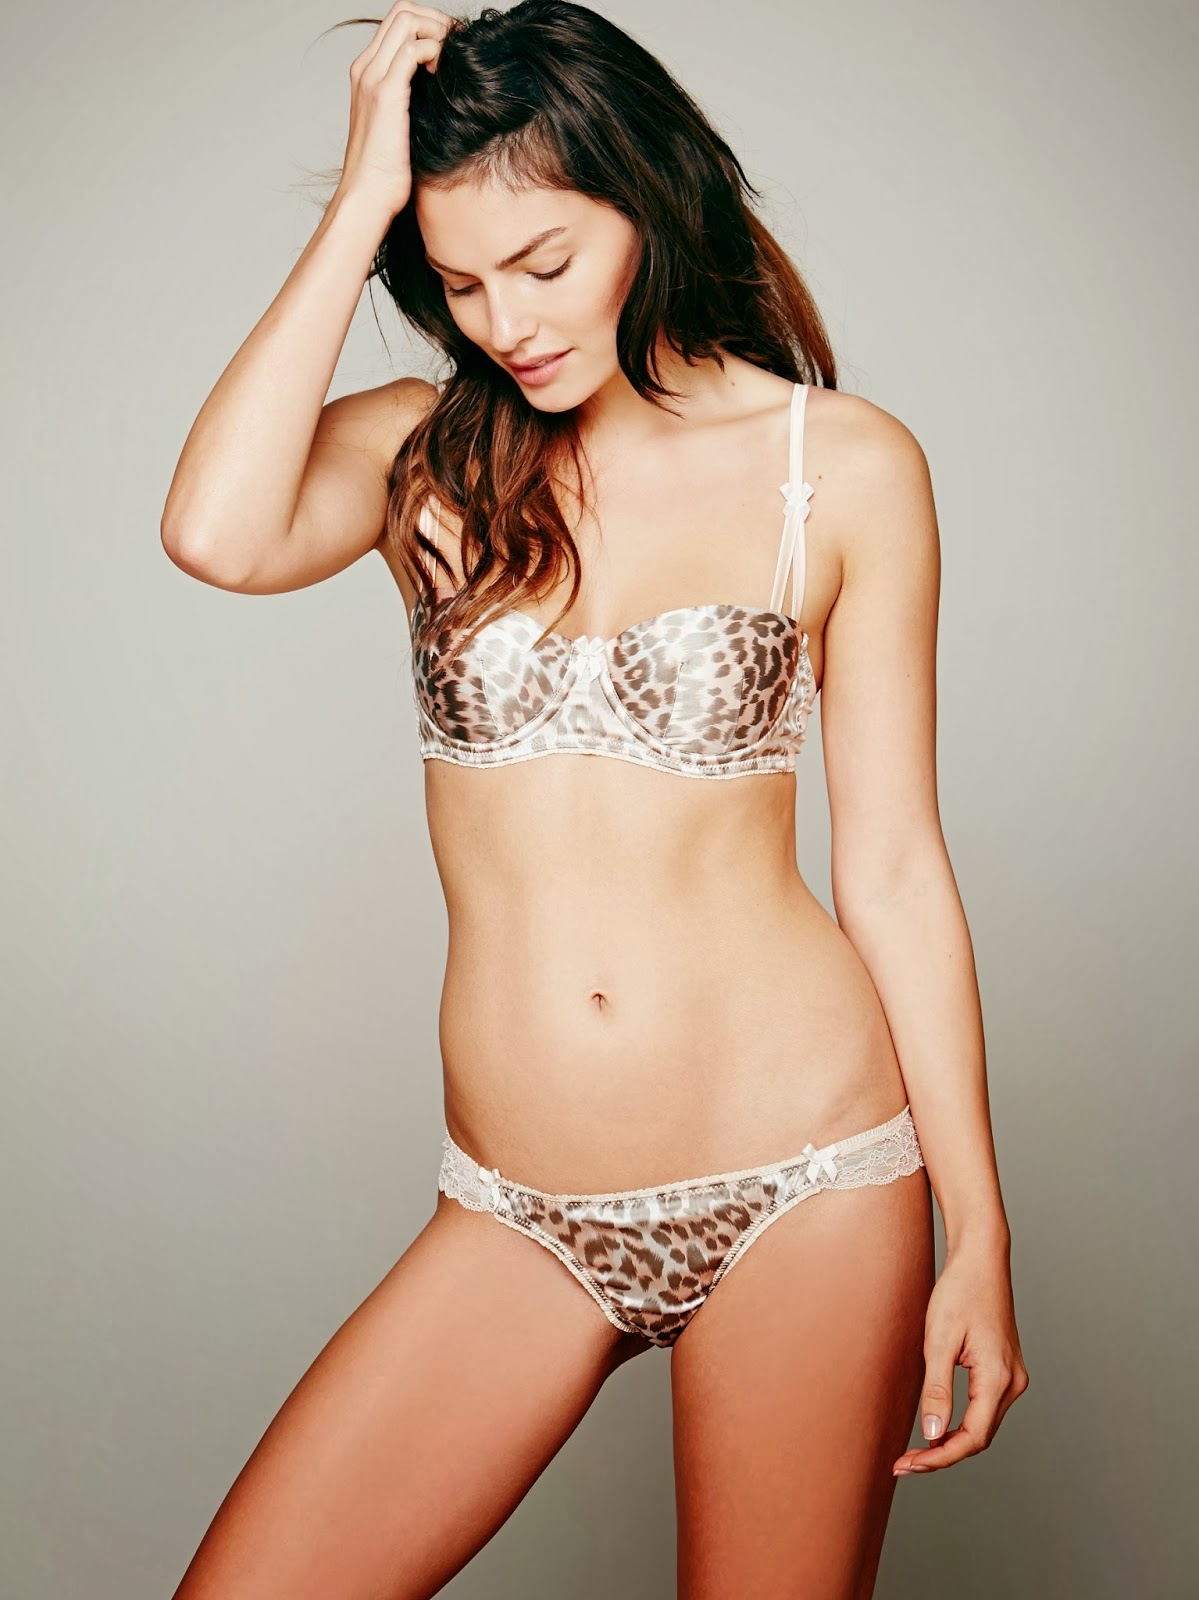 foto Vero Moda Intimates Swimwear 2013 Lookbook